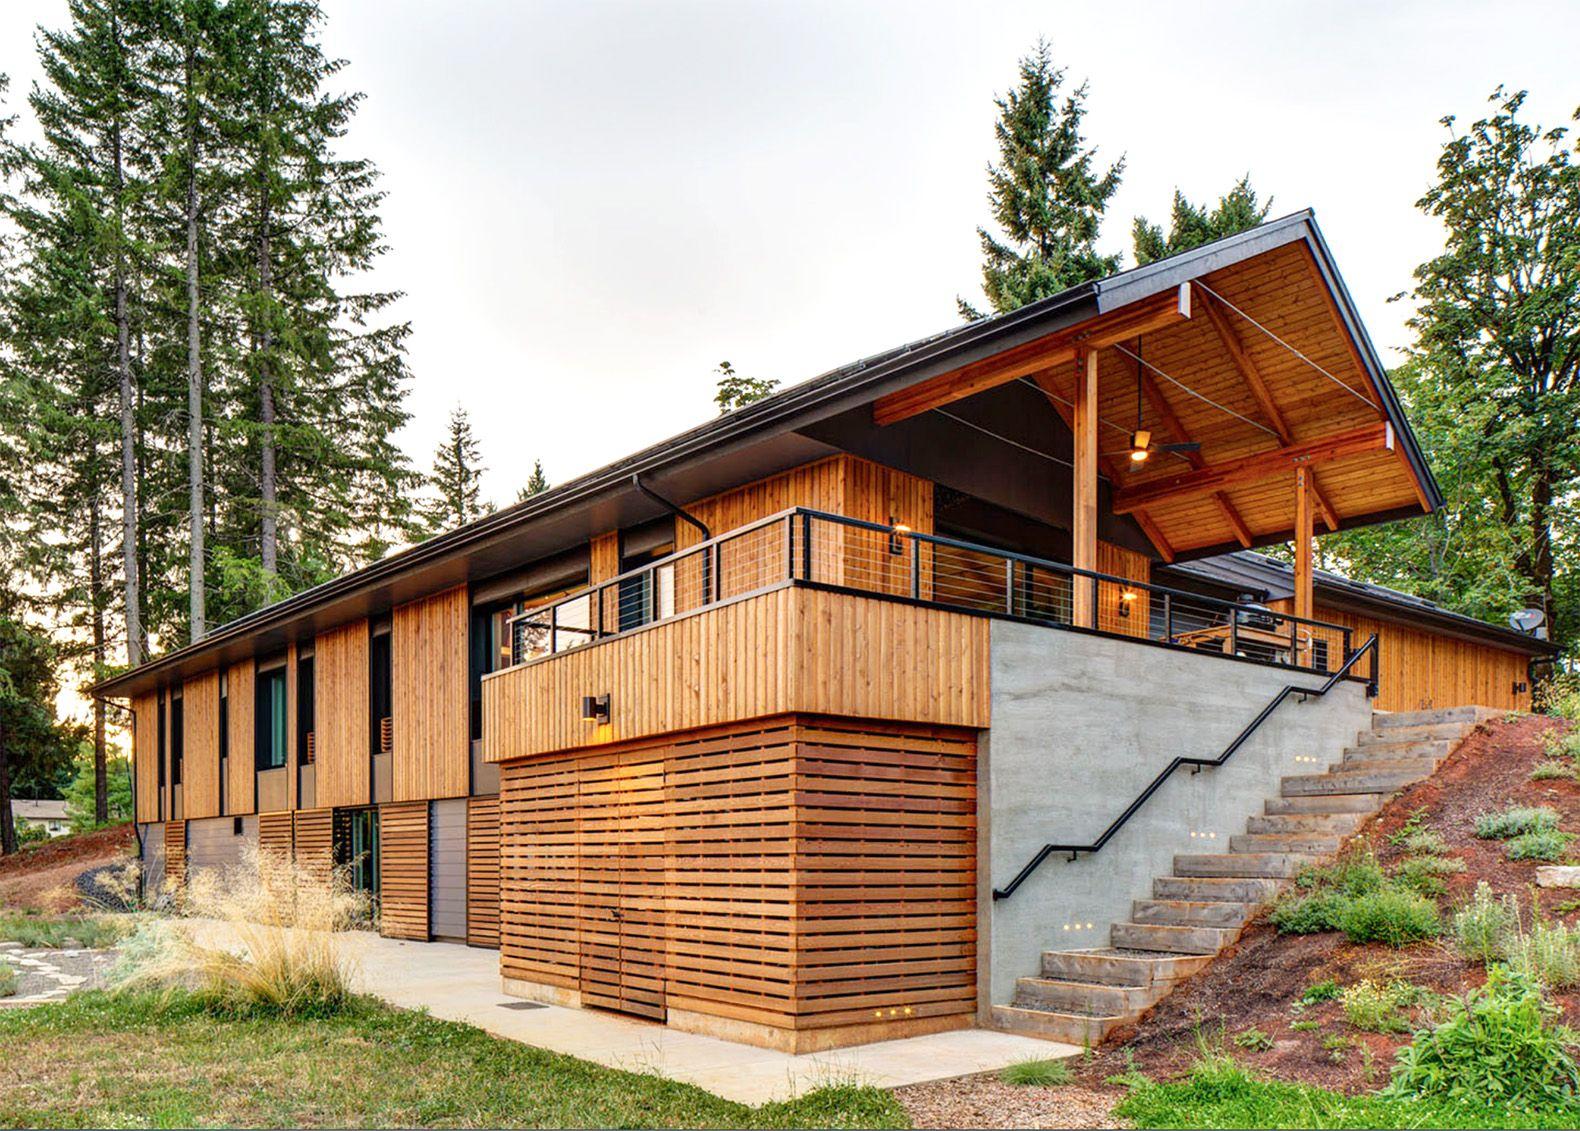 pumpkin ridge passive house consumes 90% less heating energy than